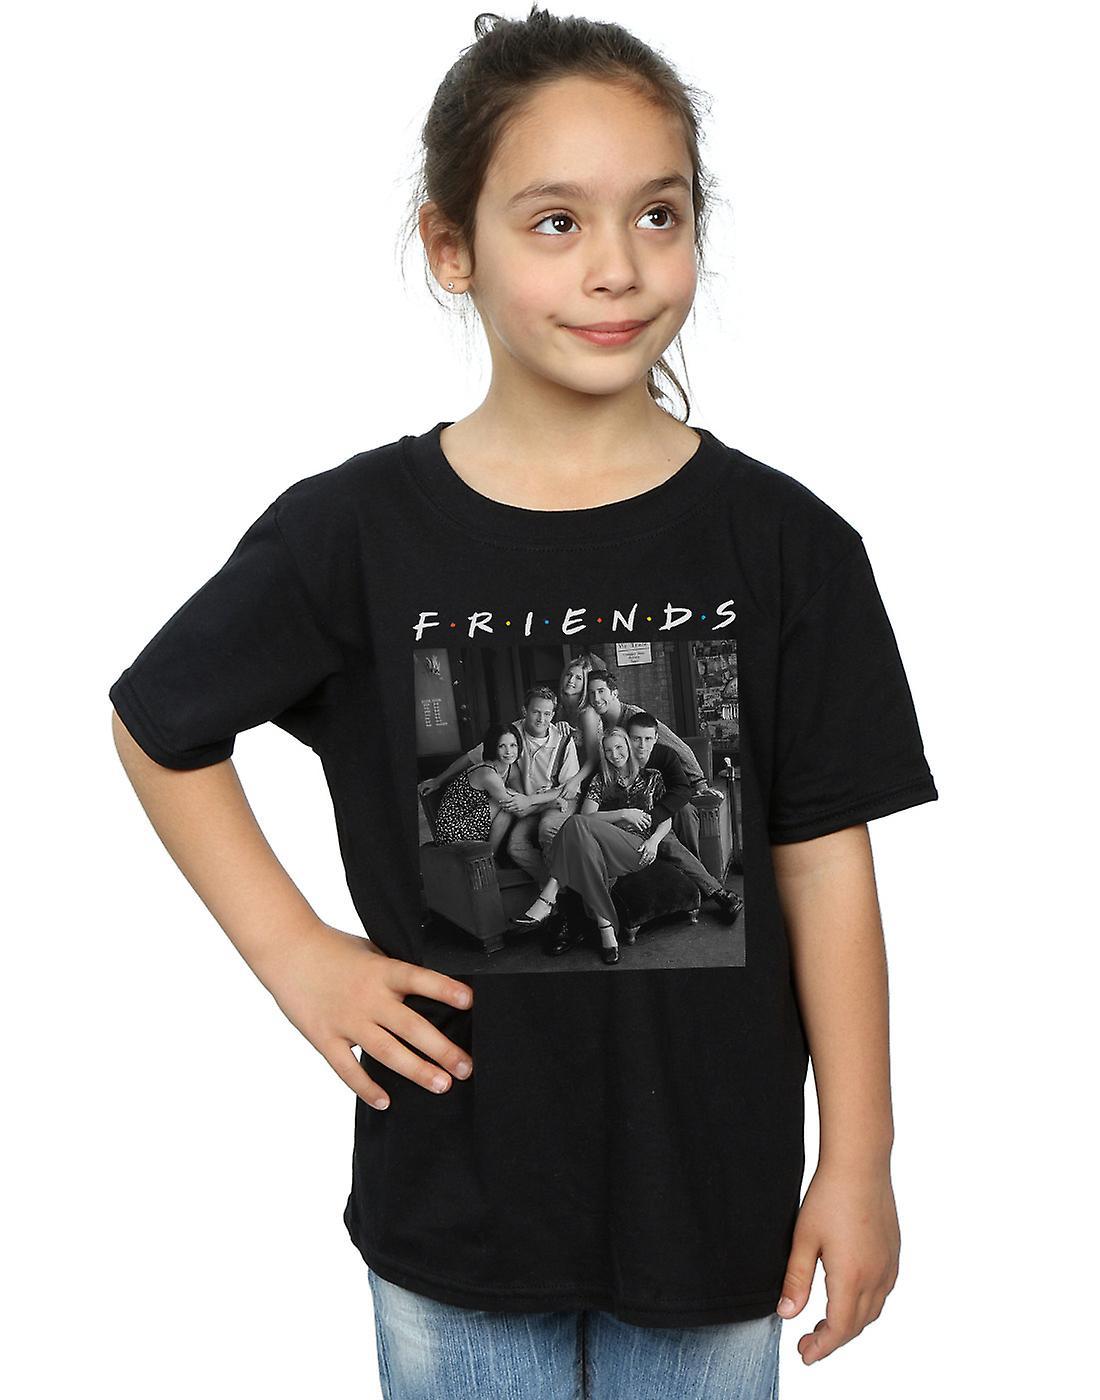 Friends Girls Black And White Photo T-Shirt